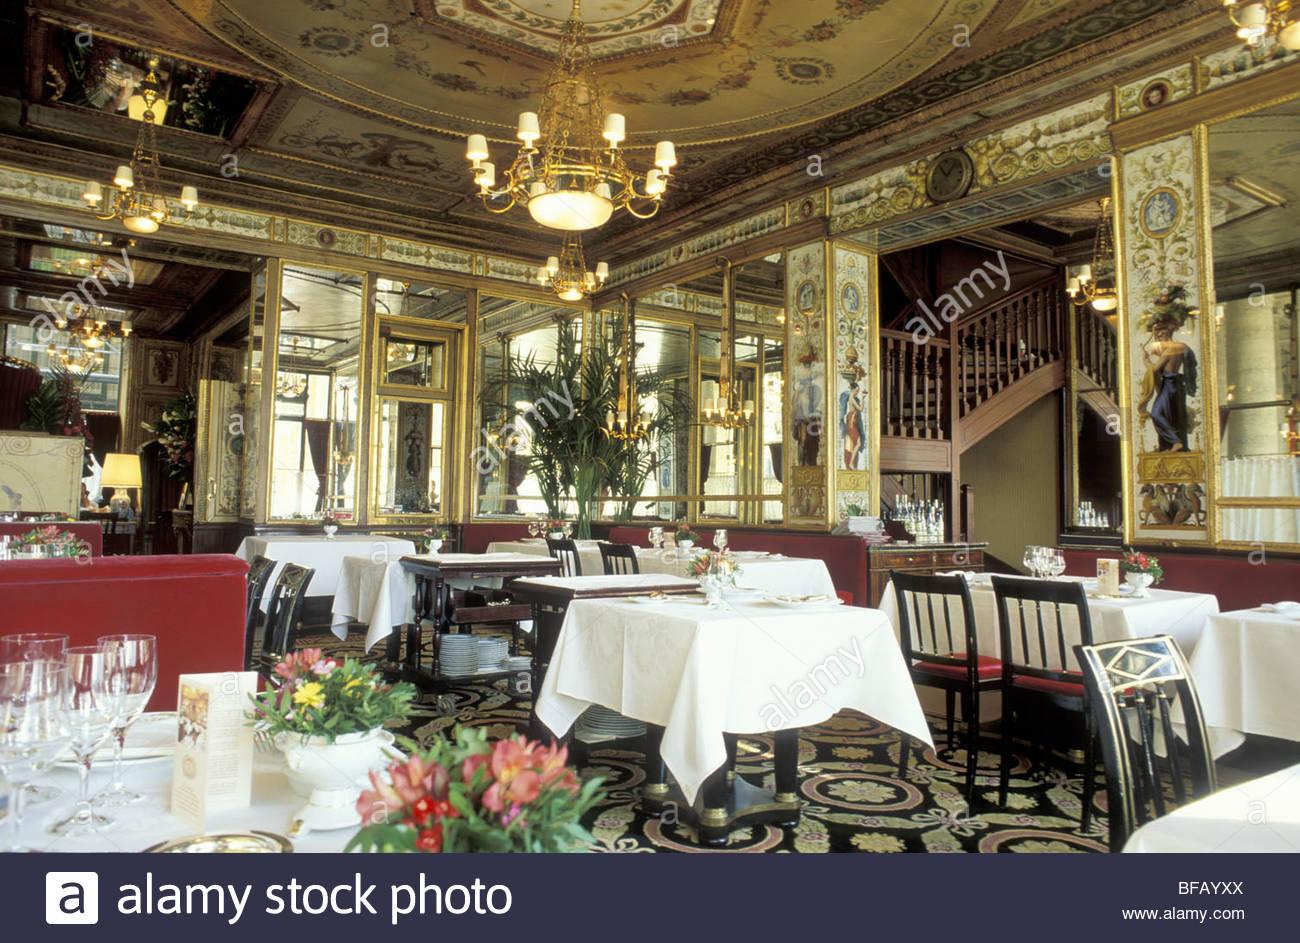 paris palais royal restaurant grand vefour stock photo royalty free image 26671650 alamy. Black Bedroom Furniture Sets. Home Design Ideas